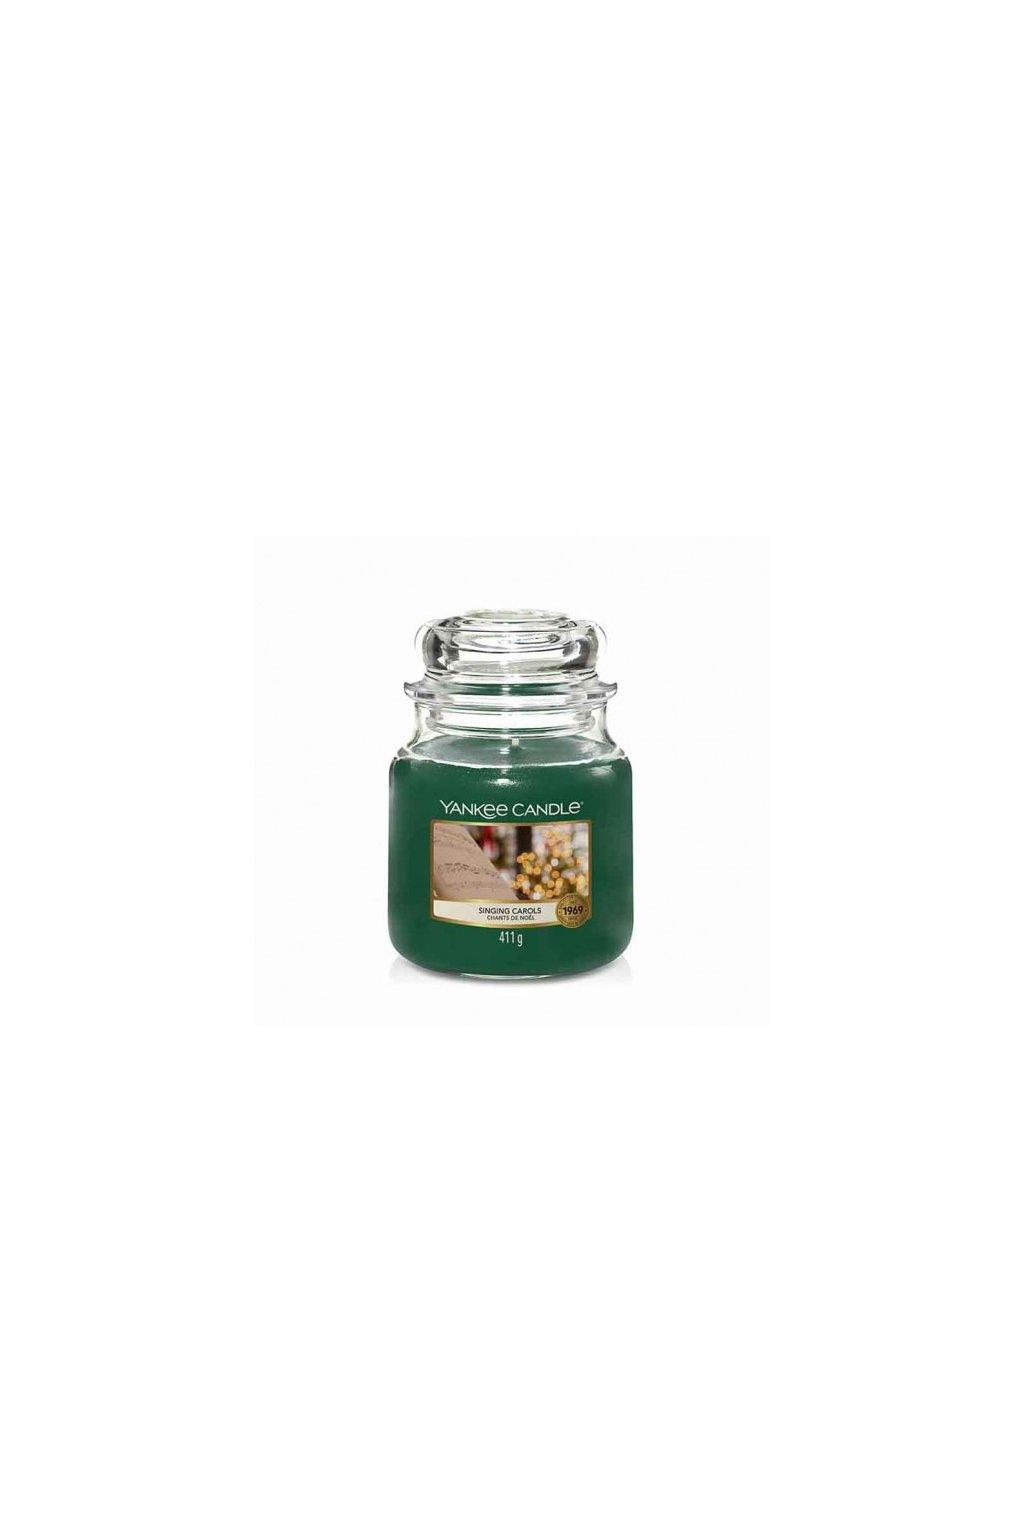 singing carols yankee candle medium jar big